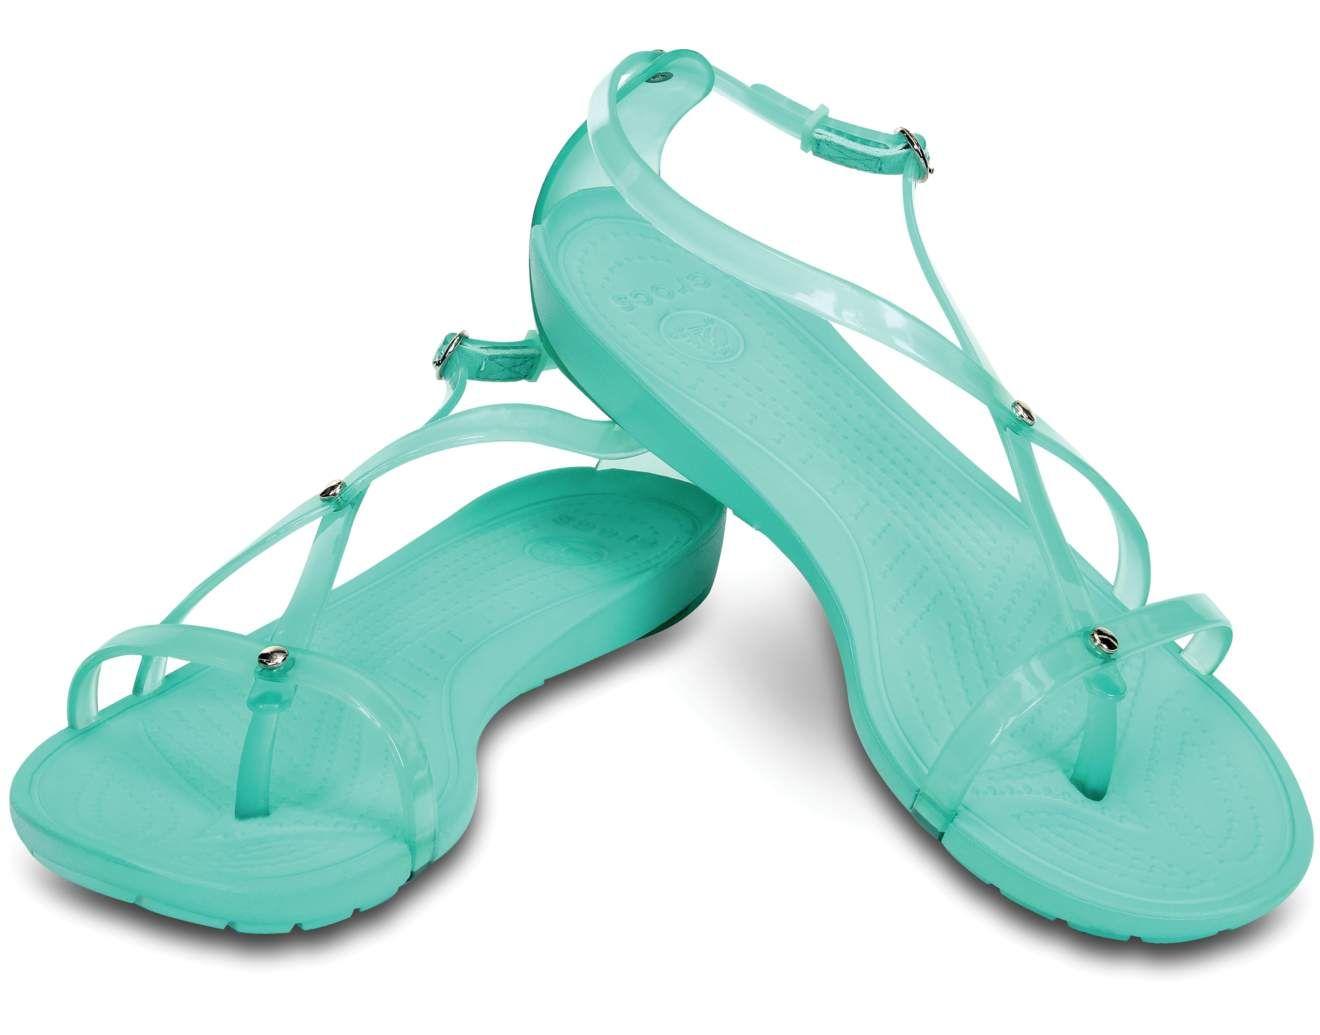 4b8103182063 CROCS Womens Really Sexi - dámske sandále zelené. Really Sexi Sandal